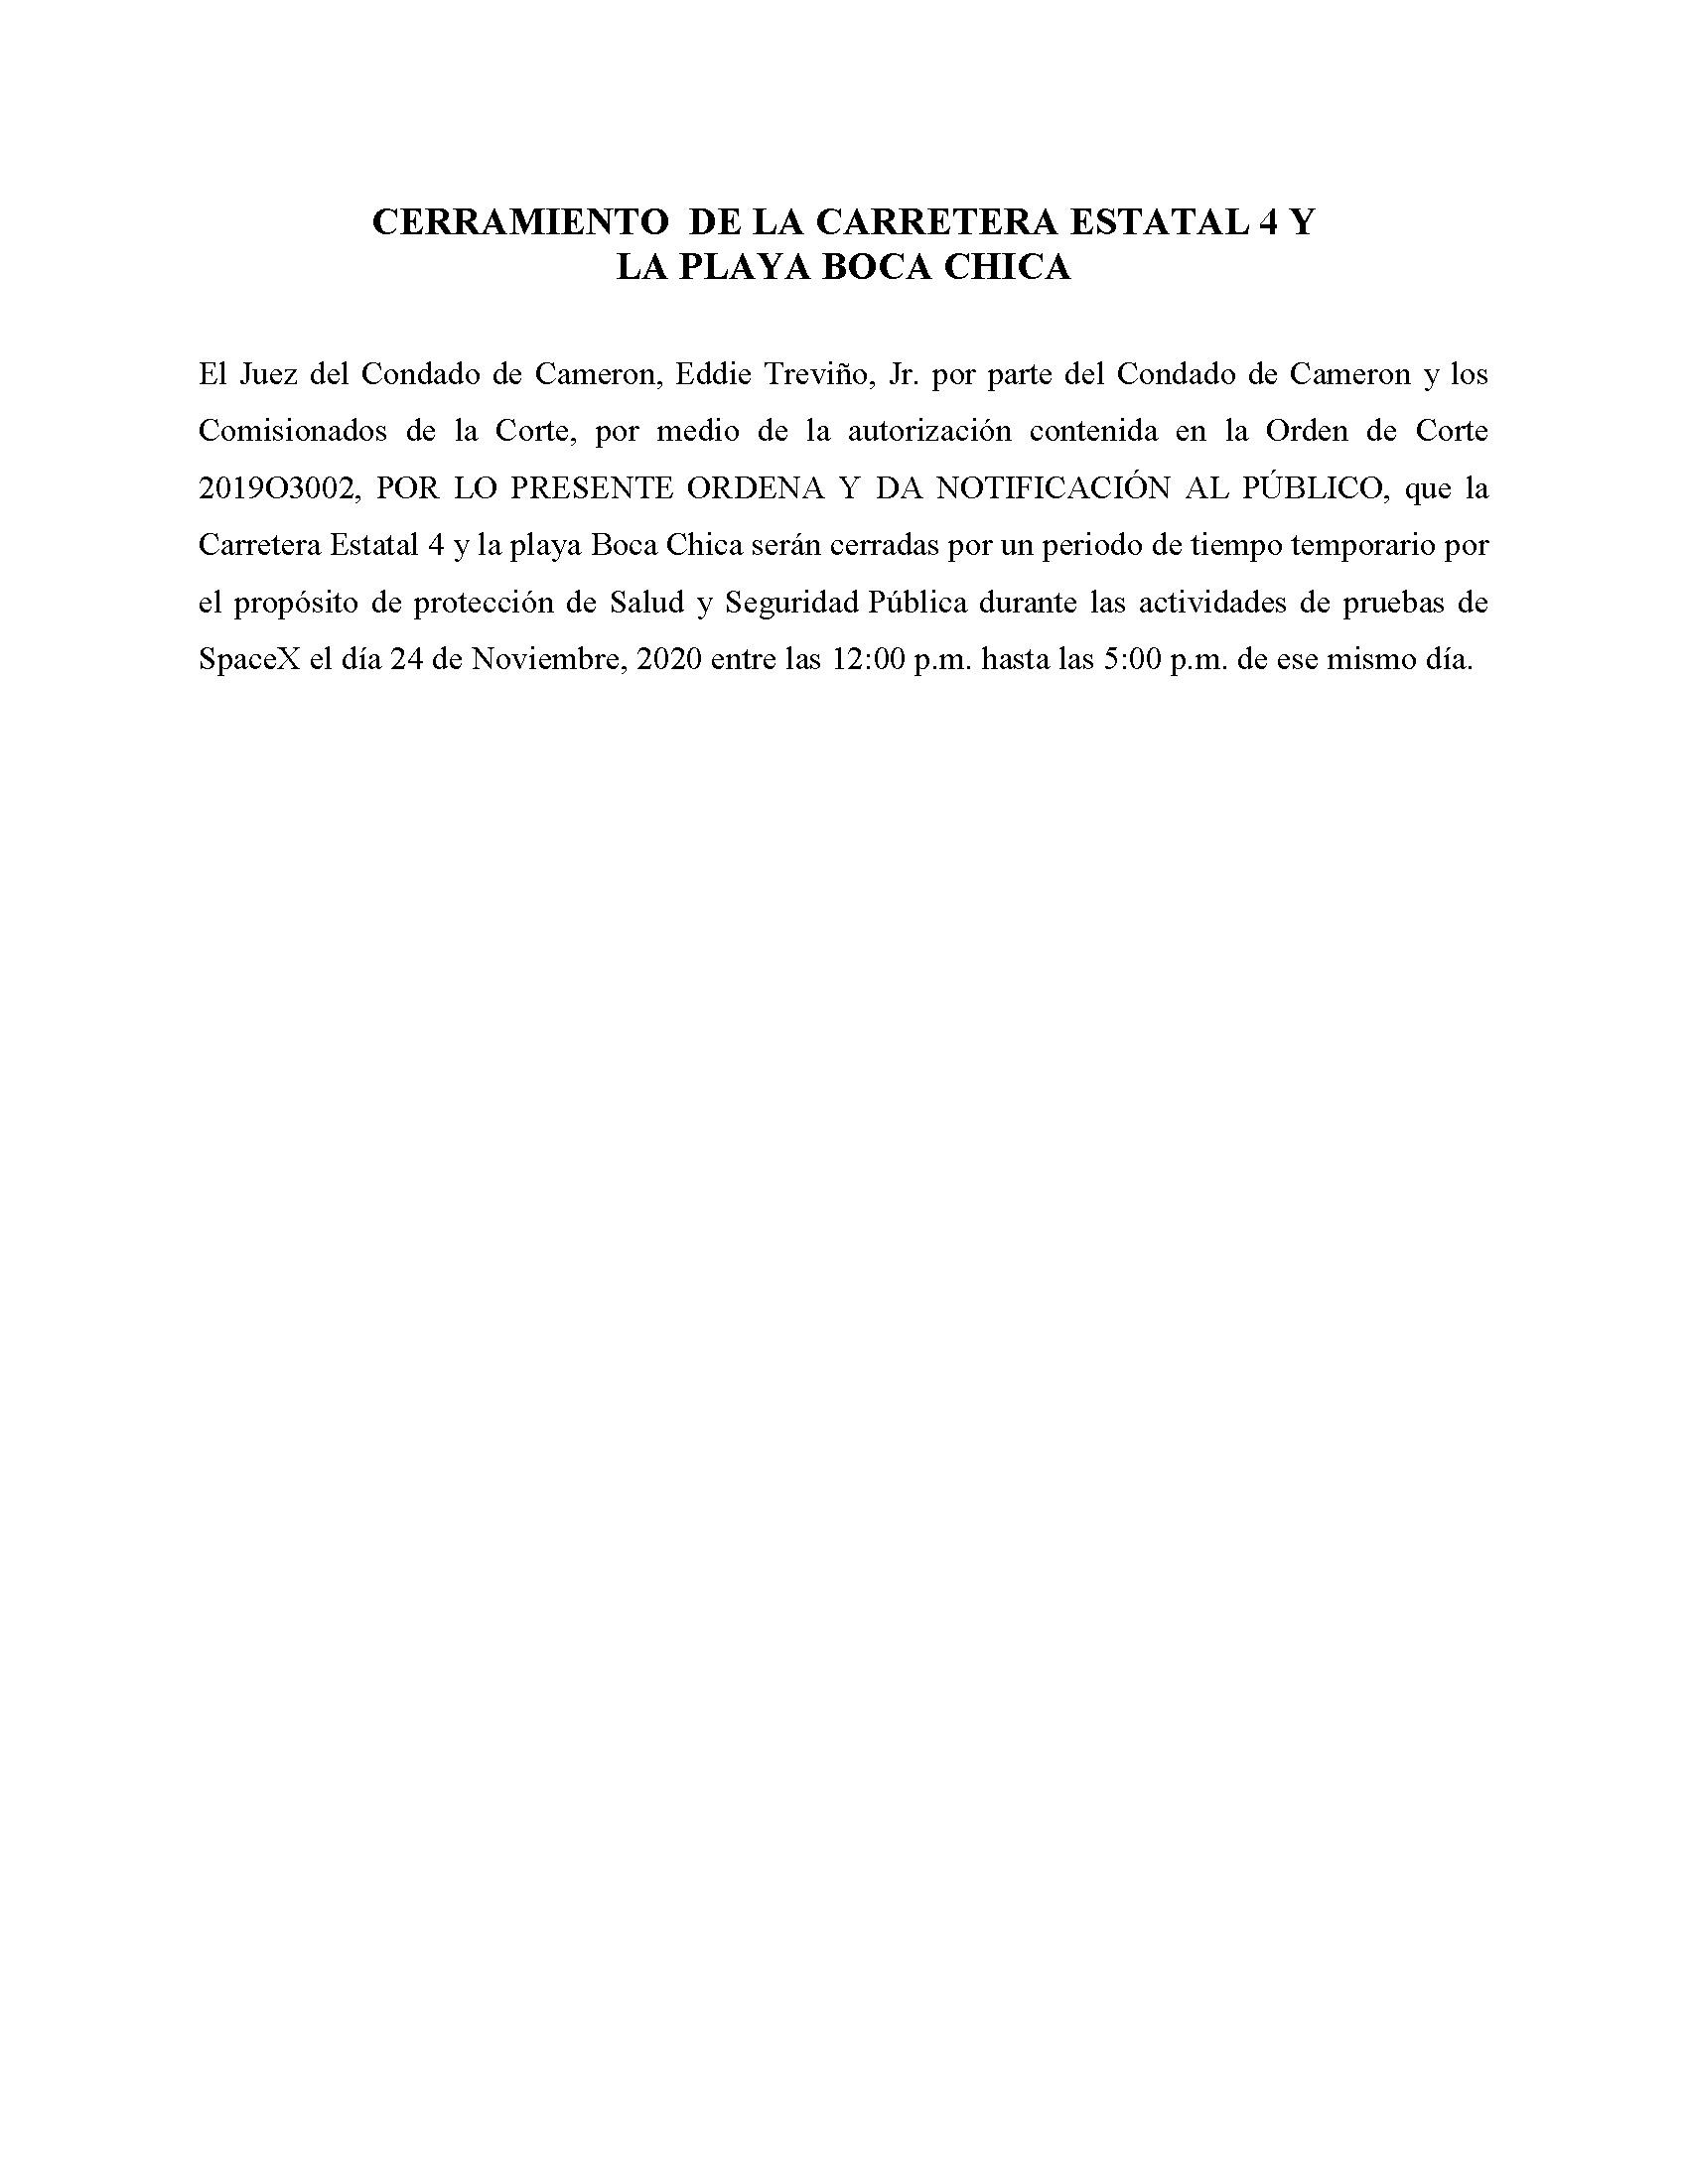 ORDER.CLOSURE OF HIGHWAY 4 Y LA PLAYA BOCA CHICA.SPANISH.11.24.20